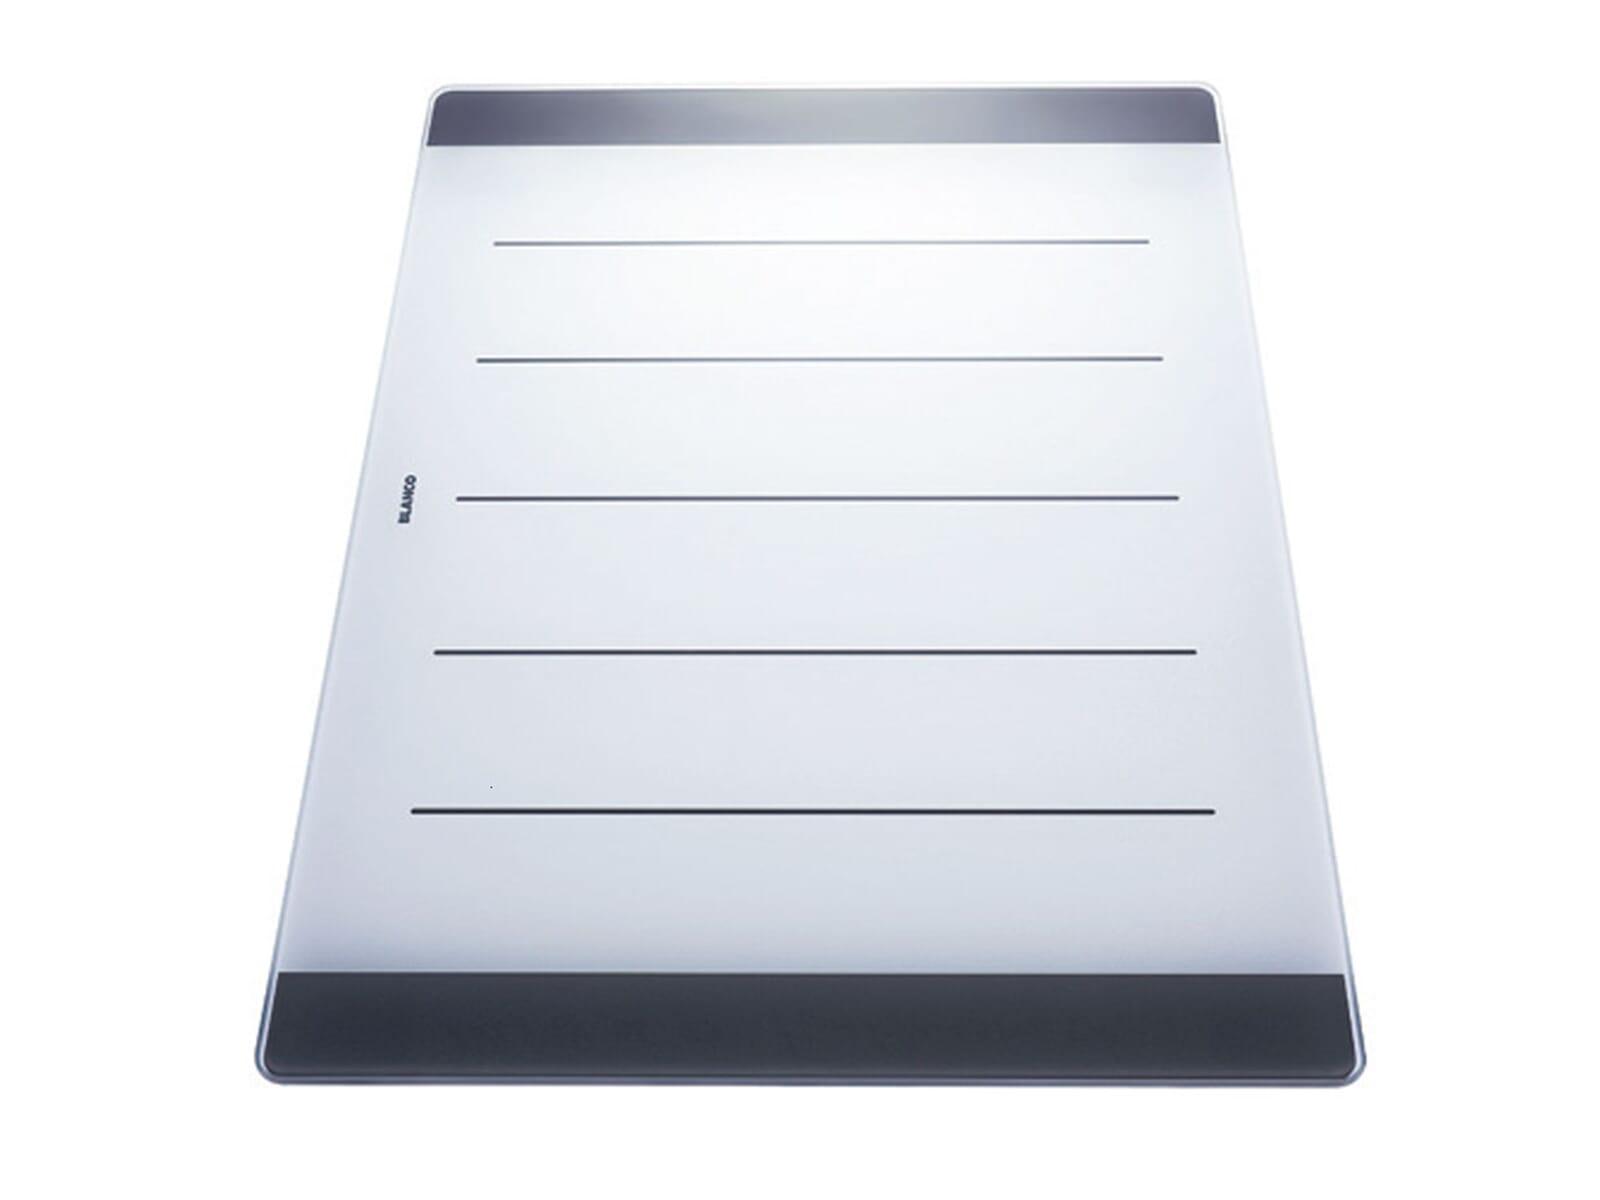 blanco axis 6 s m edelstahl auflage k chensp le einbausp le k che sp lbecken ebay. Black Bedroom Furniture Sets. Home Design Ideas